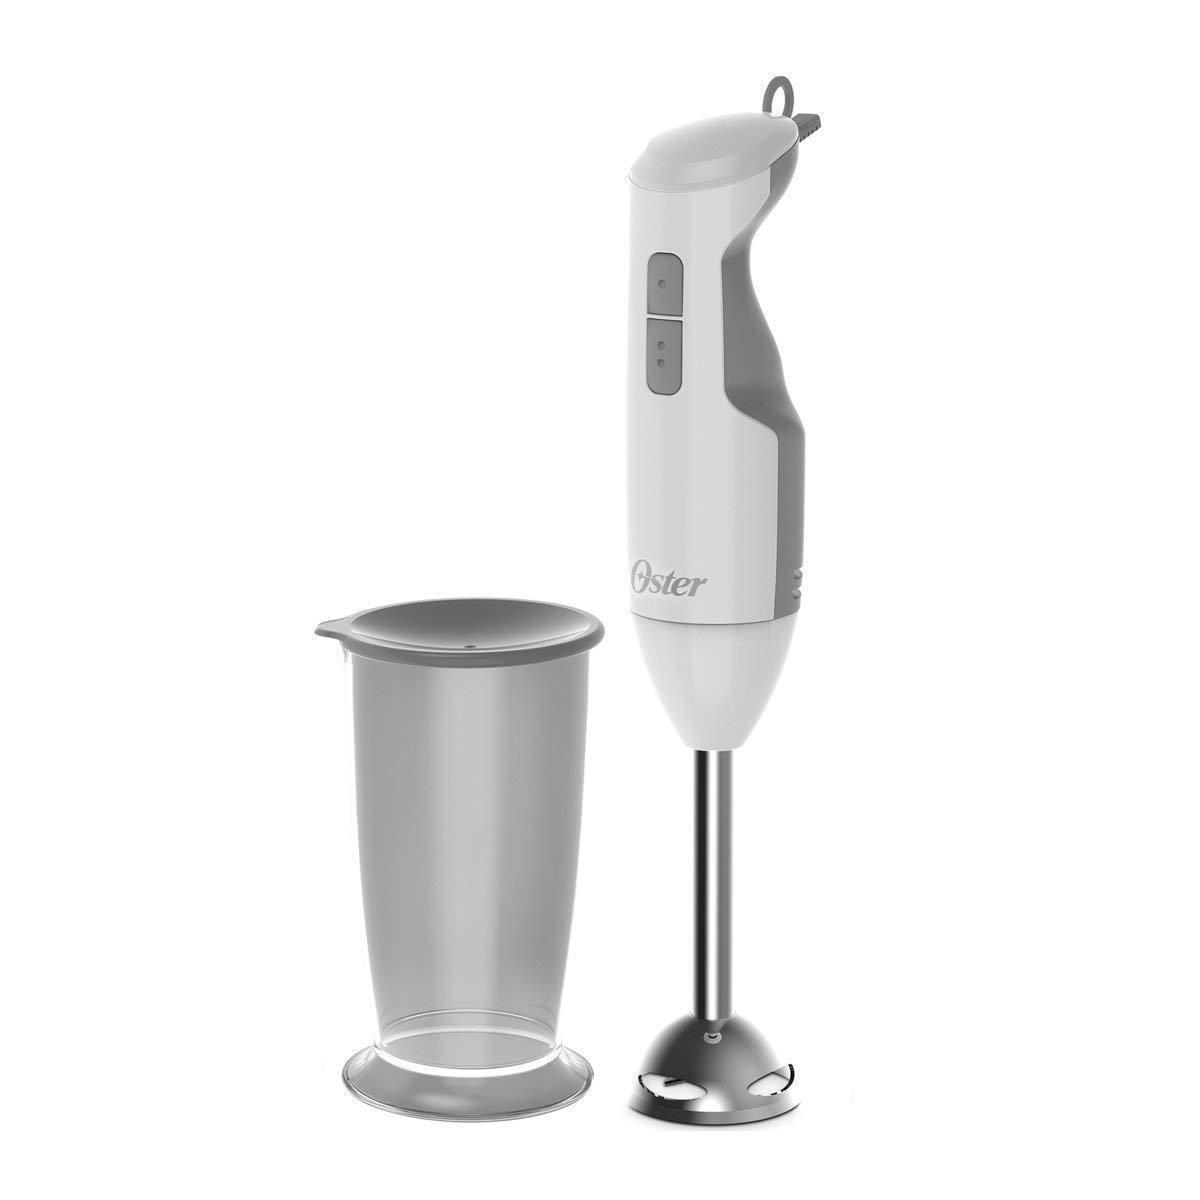 Oster Versatile Turbo Function Stick Mixer Hand Blender 250